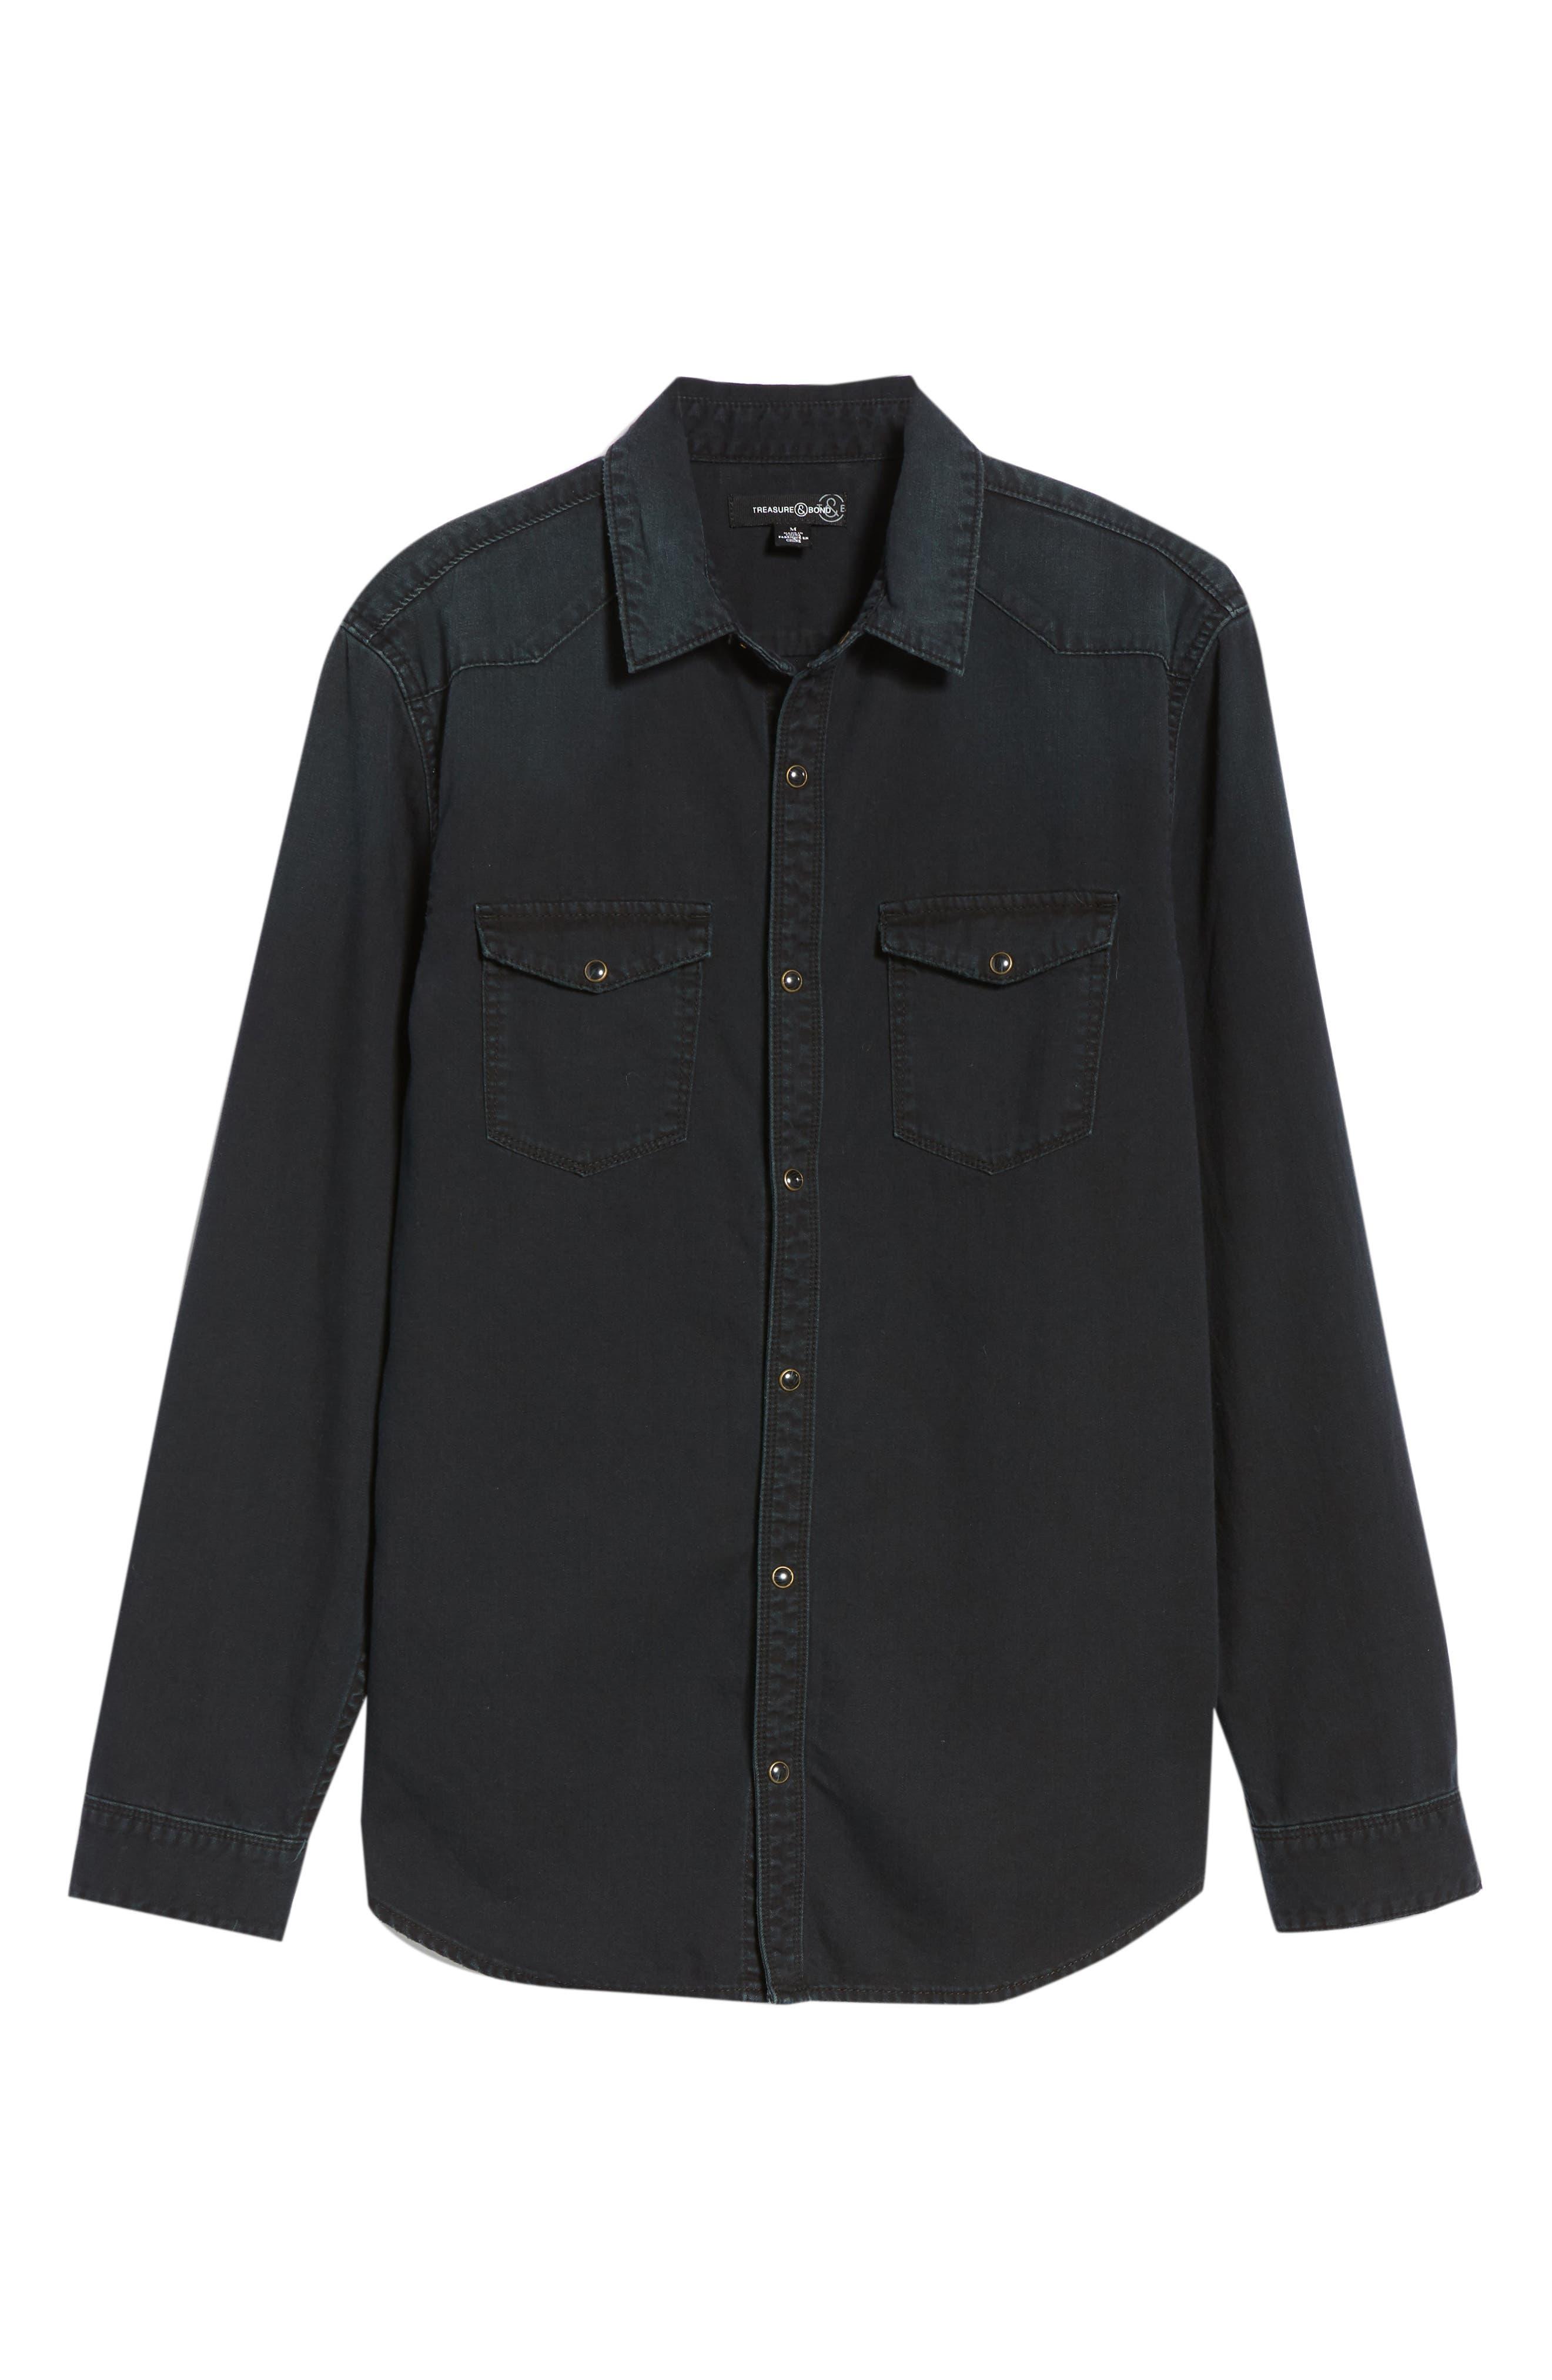 TREASURE & BOND,                             Western Denim Sport Shirt,                             Alternate thumbnail 6, color,                             002